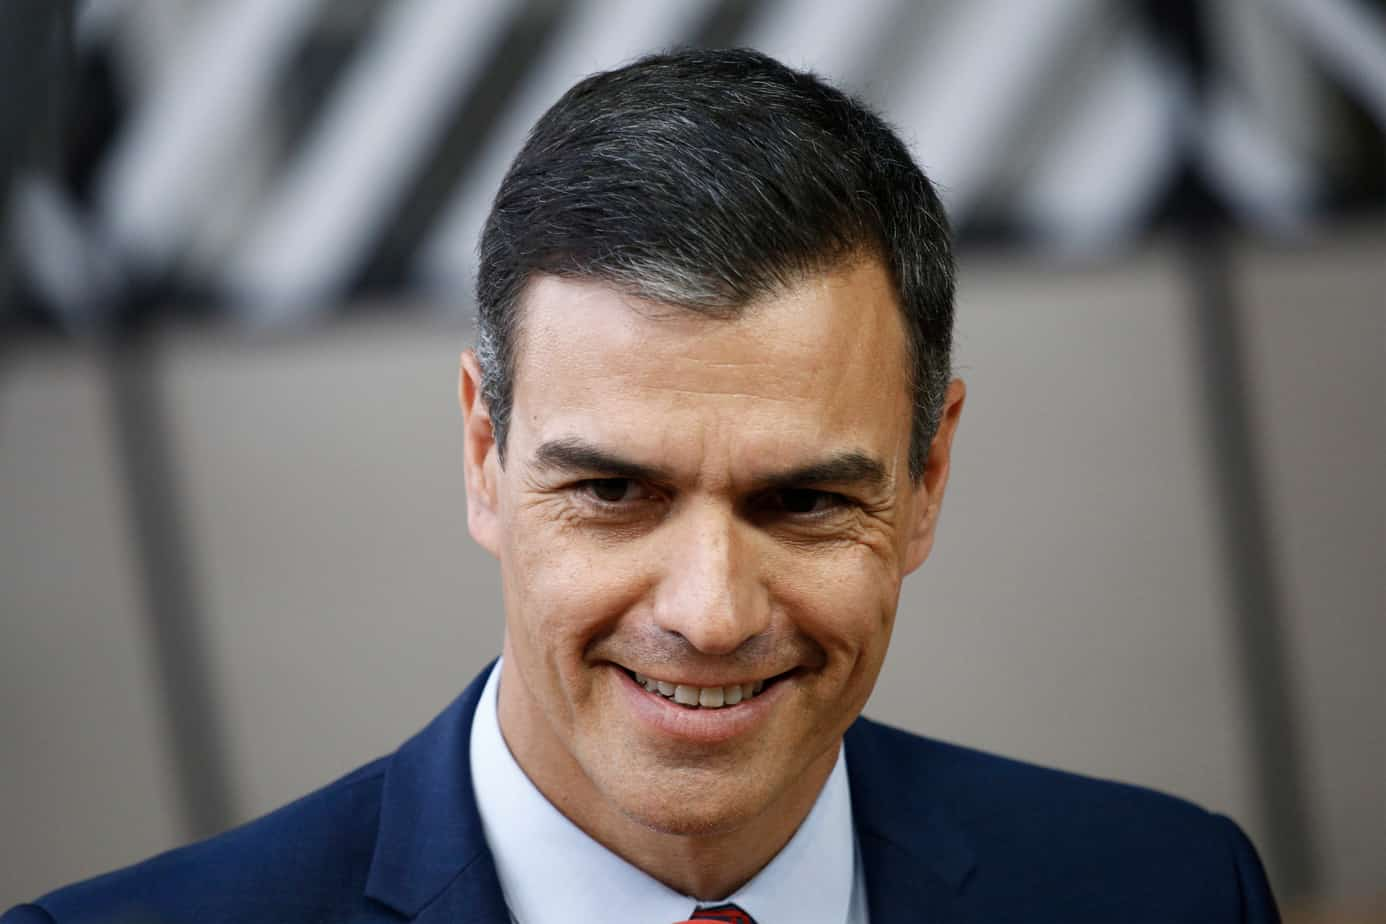 The Iberian driver for European Social Democracy